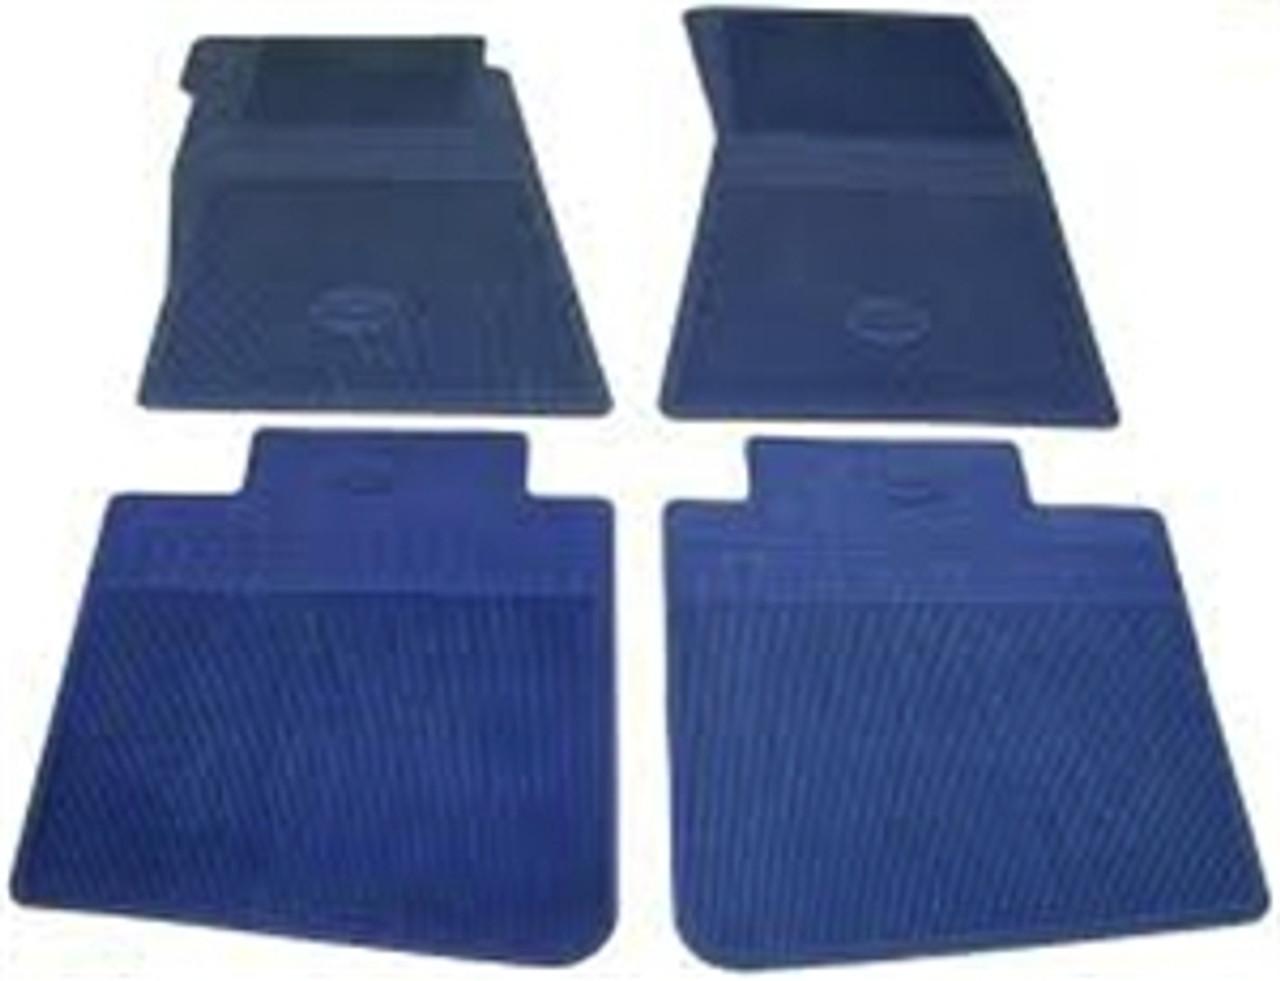 1964-72 Chevelle Rubber Bowtie Floor Mats (Dk. Blue)